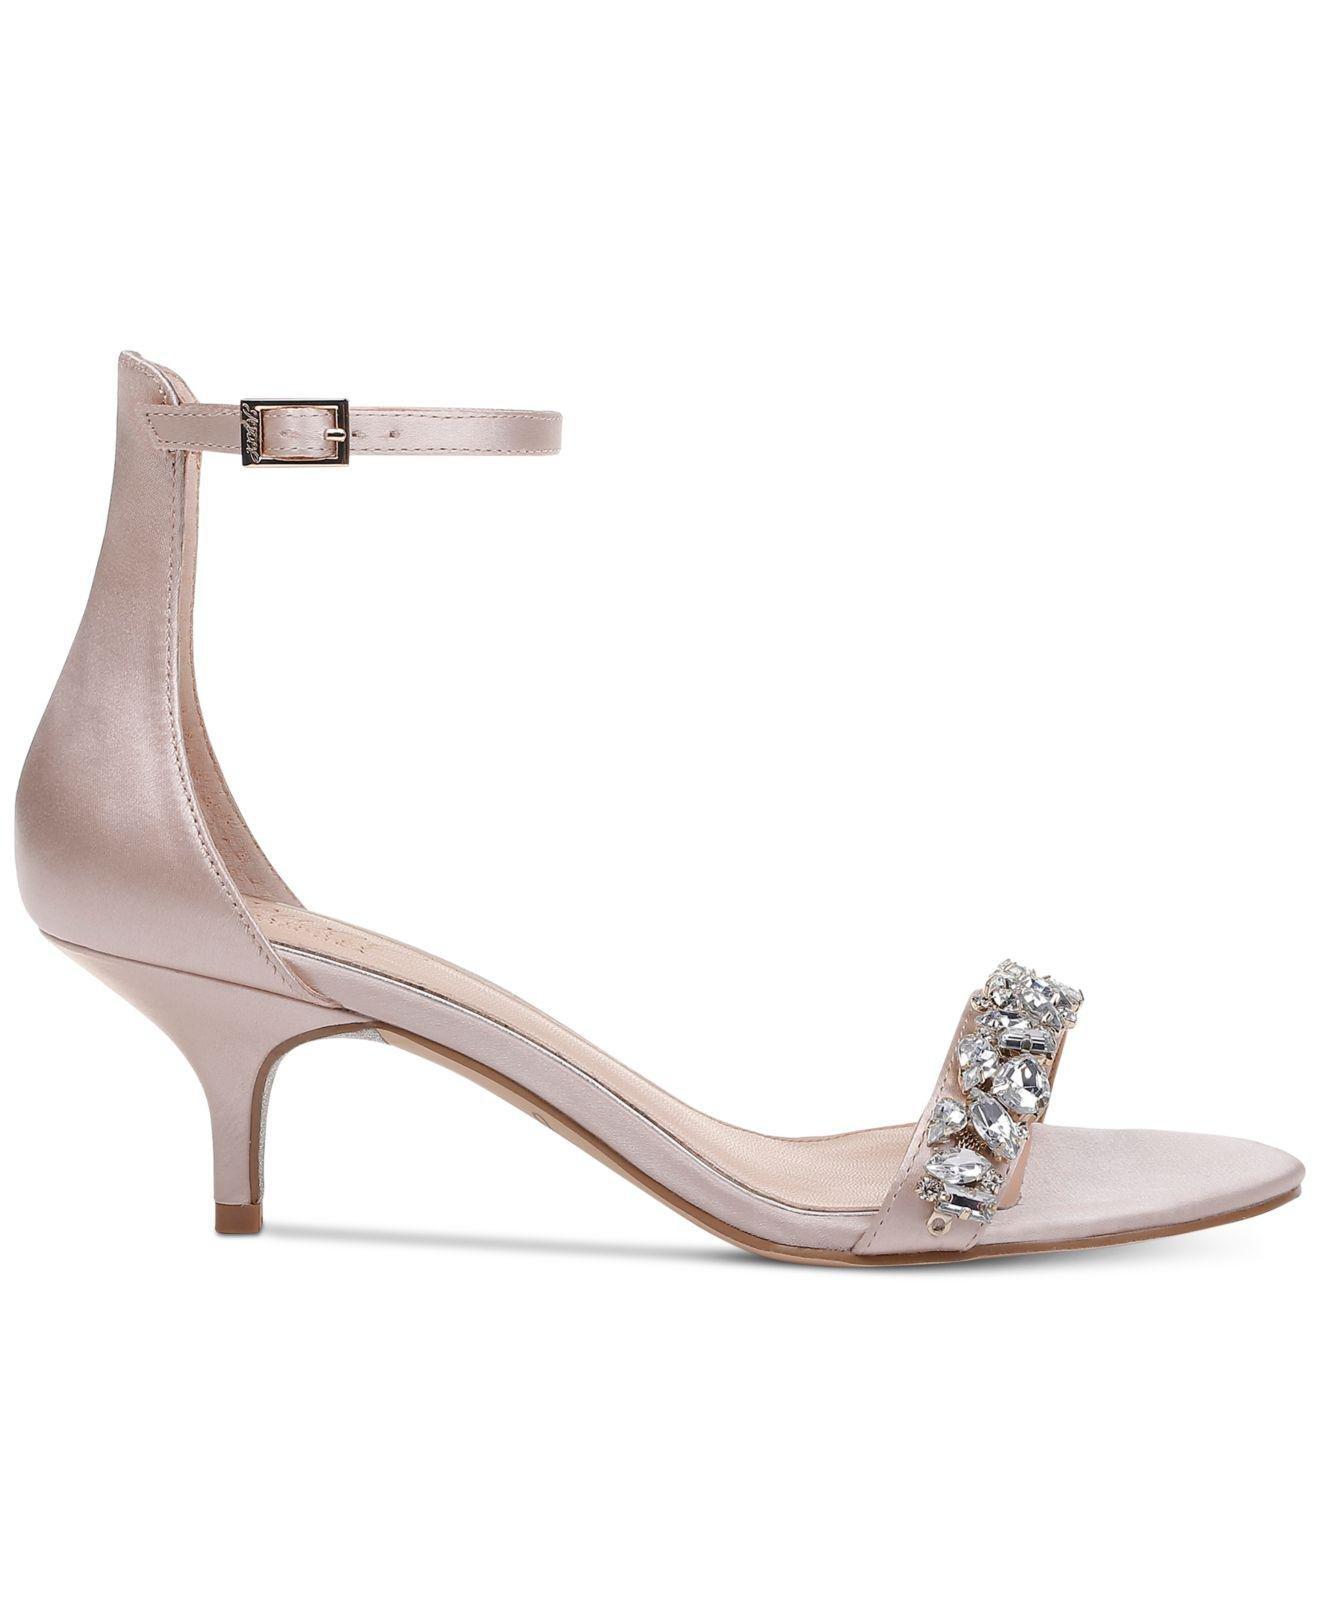 45bcd64e31f Lyst - Badgley Mischka Dash Kitten-heel Evening Sandals